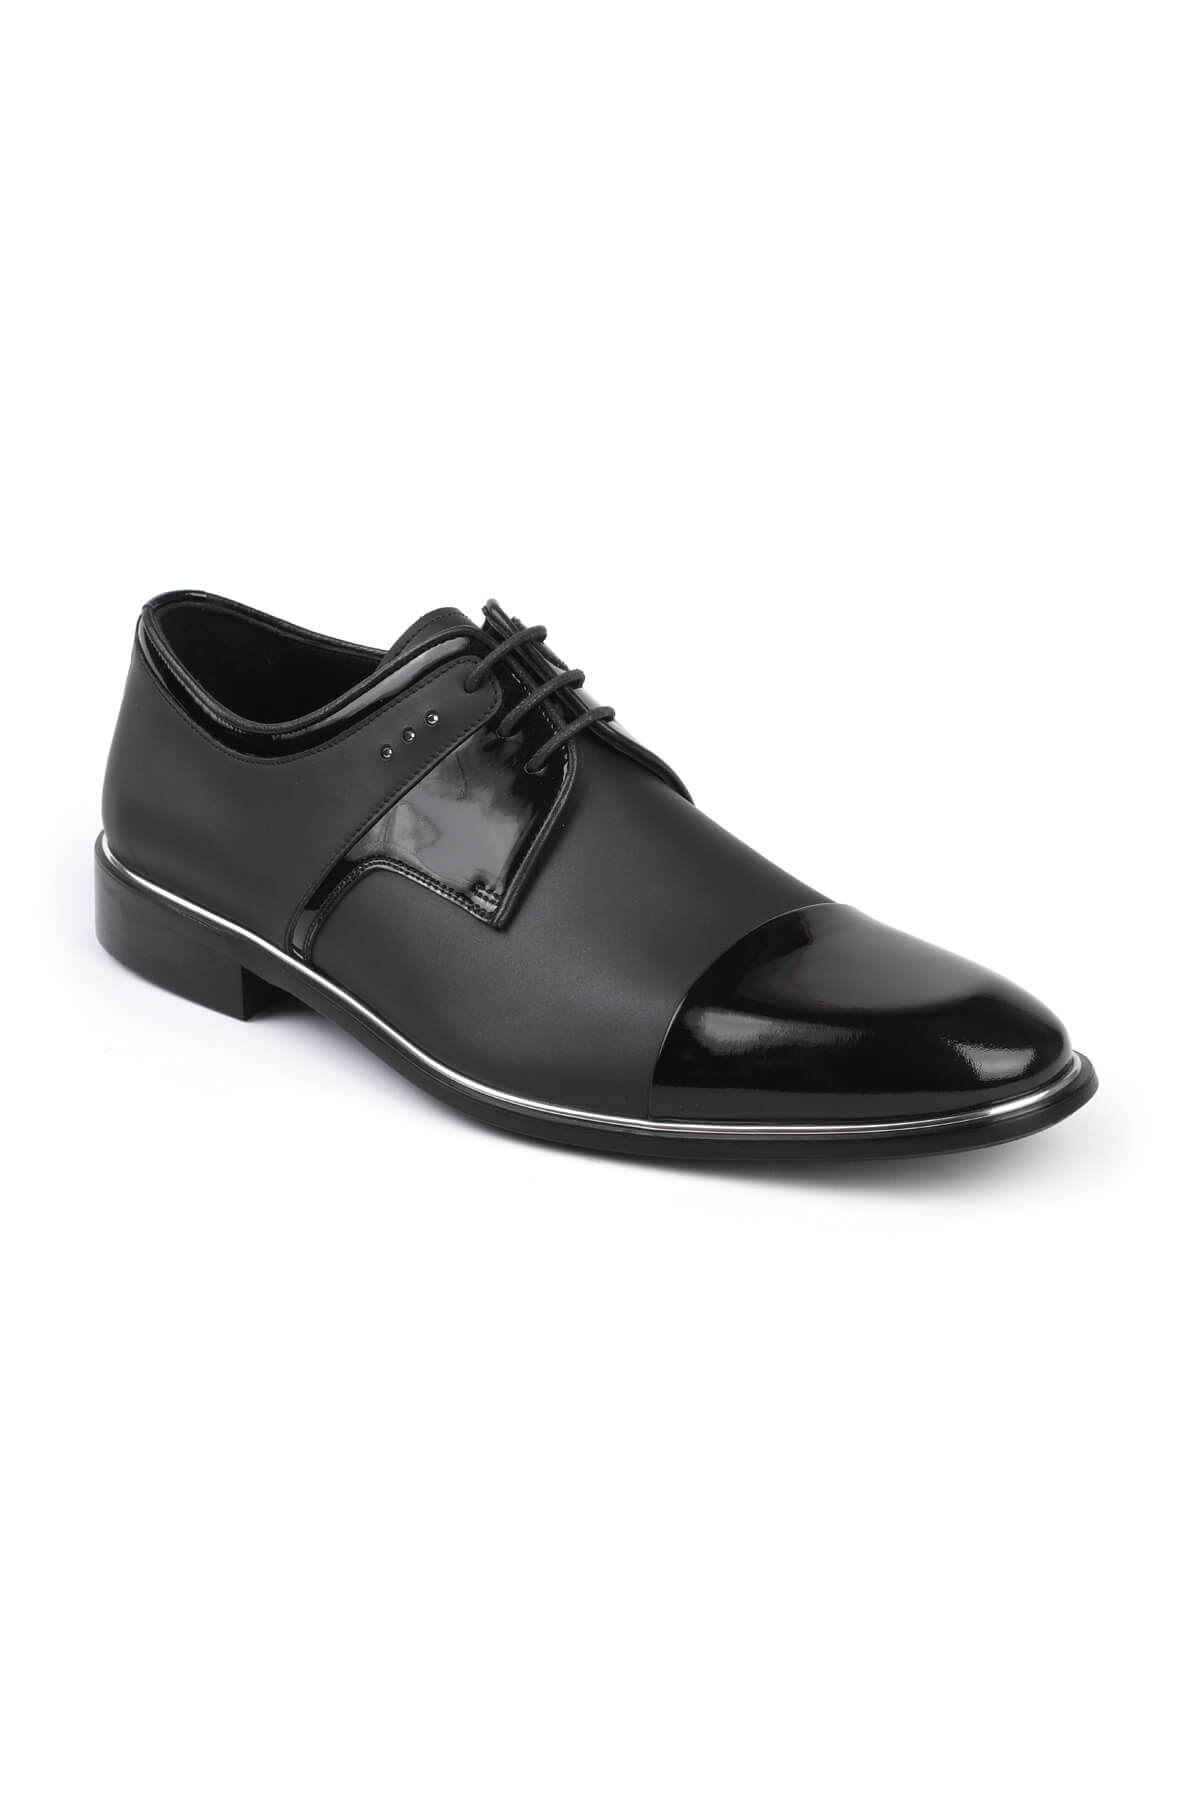 Libero 2862 Black Classic Shoes